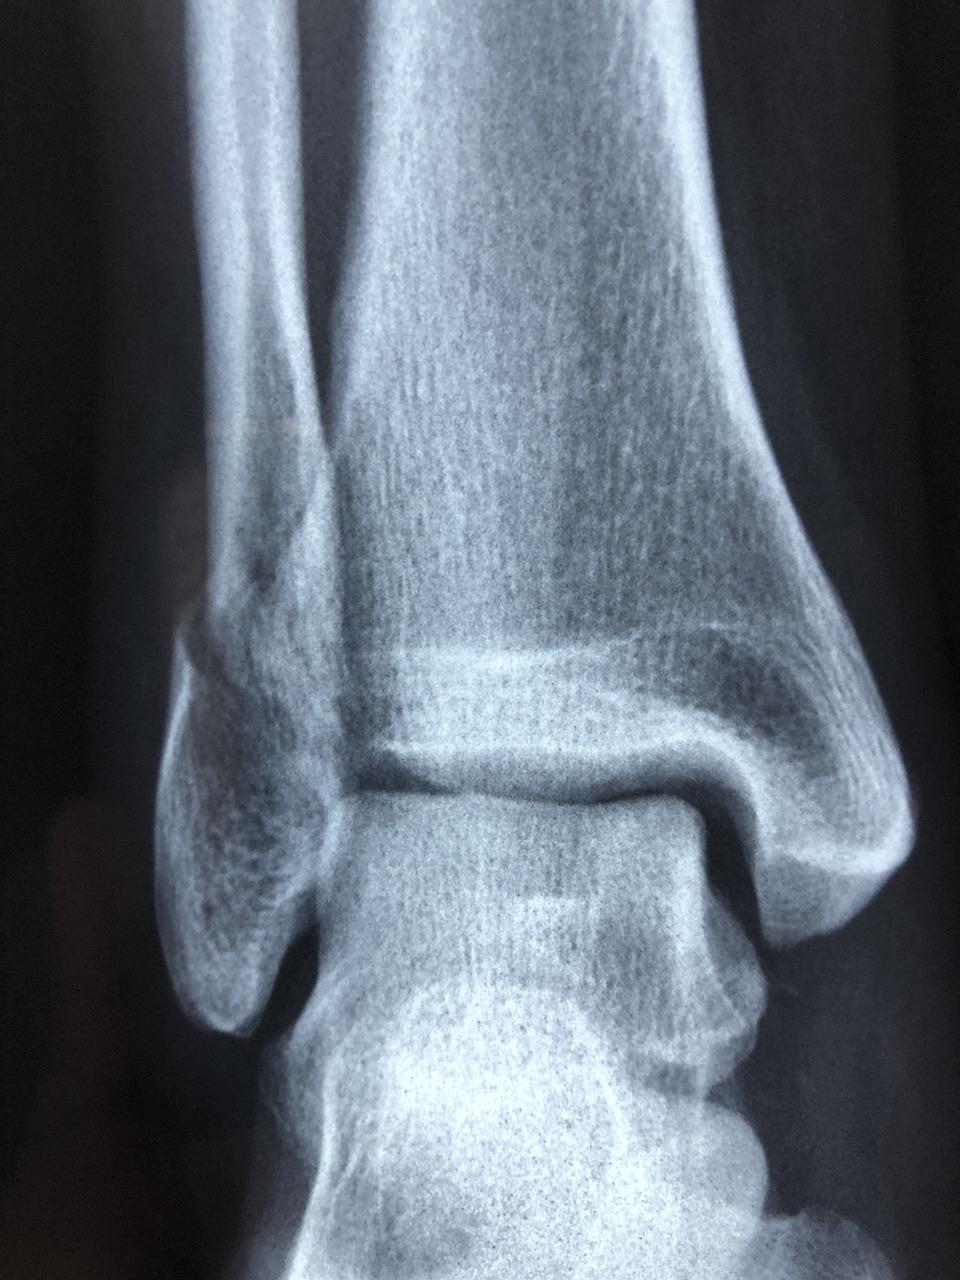 radiography-3057768_1280